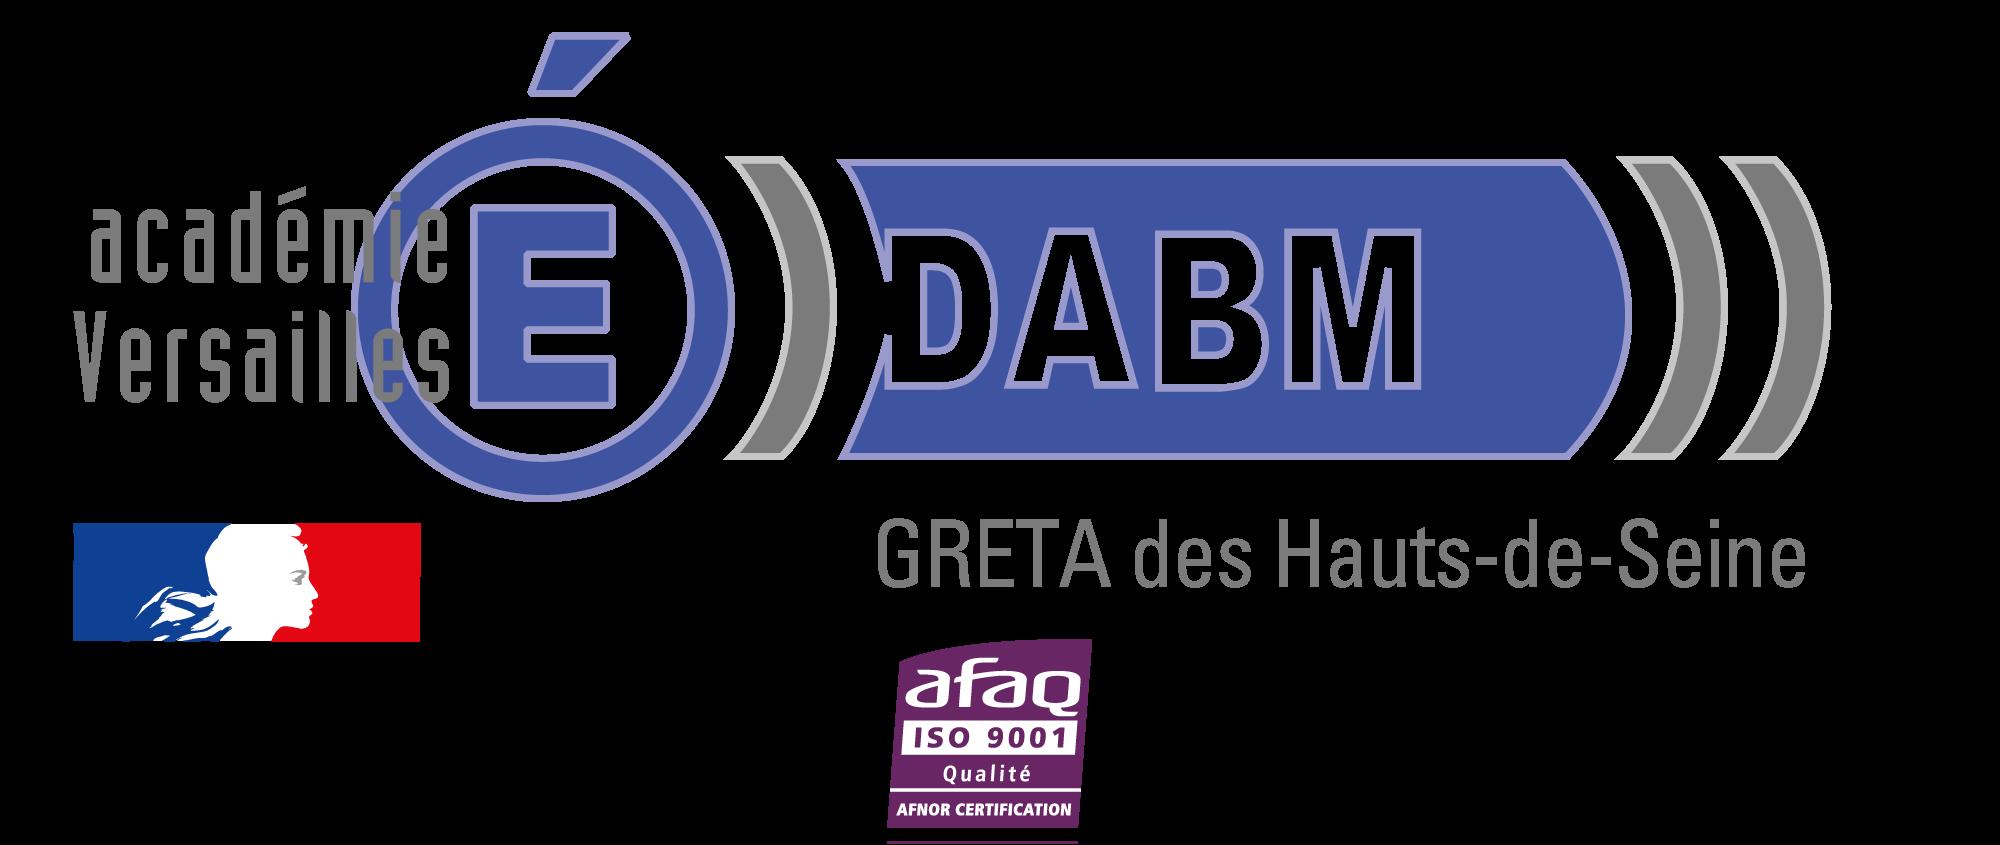 Centre DABM 92 - Nanterre